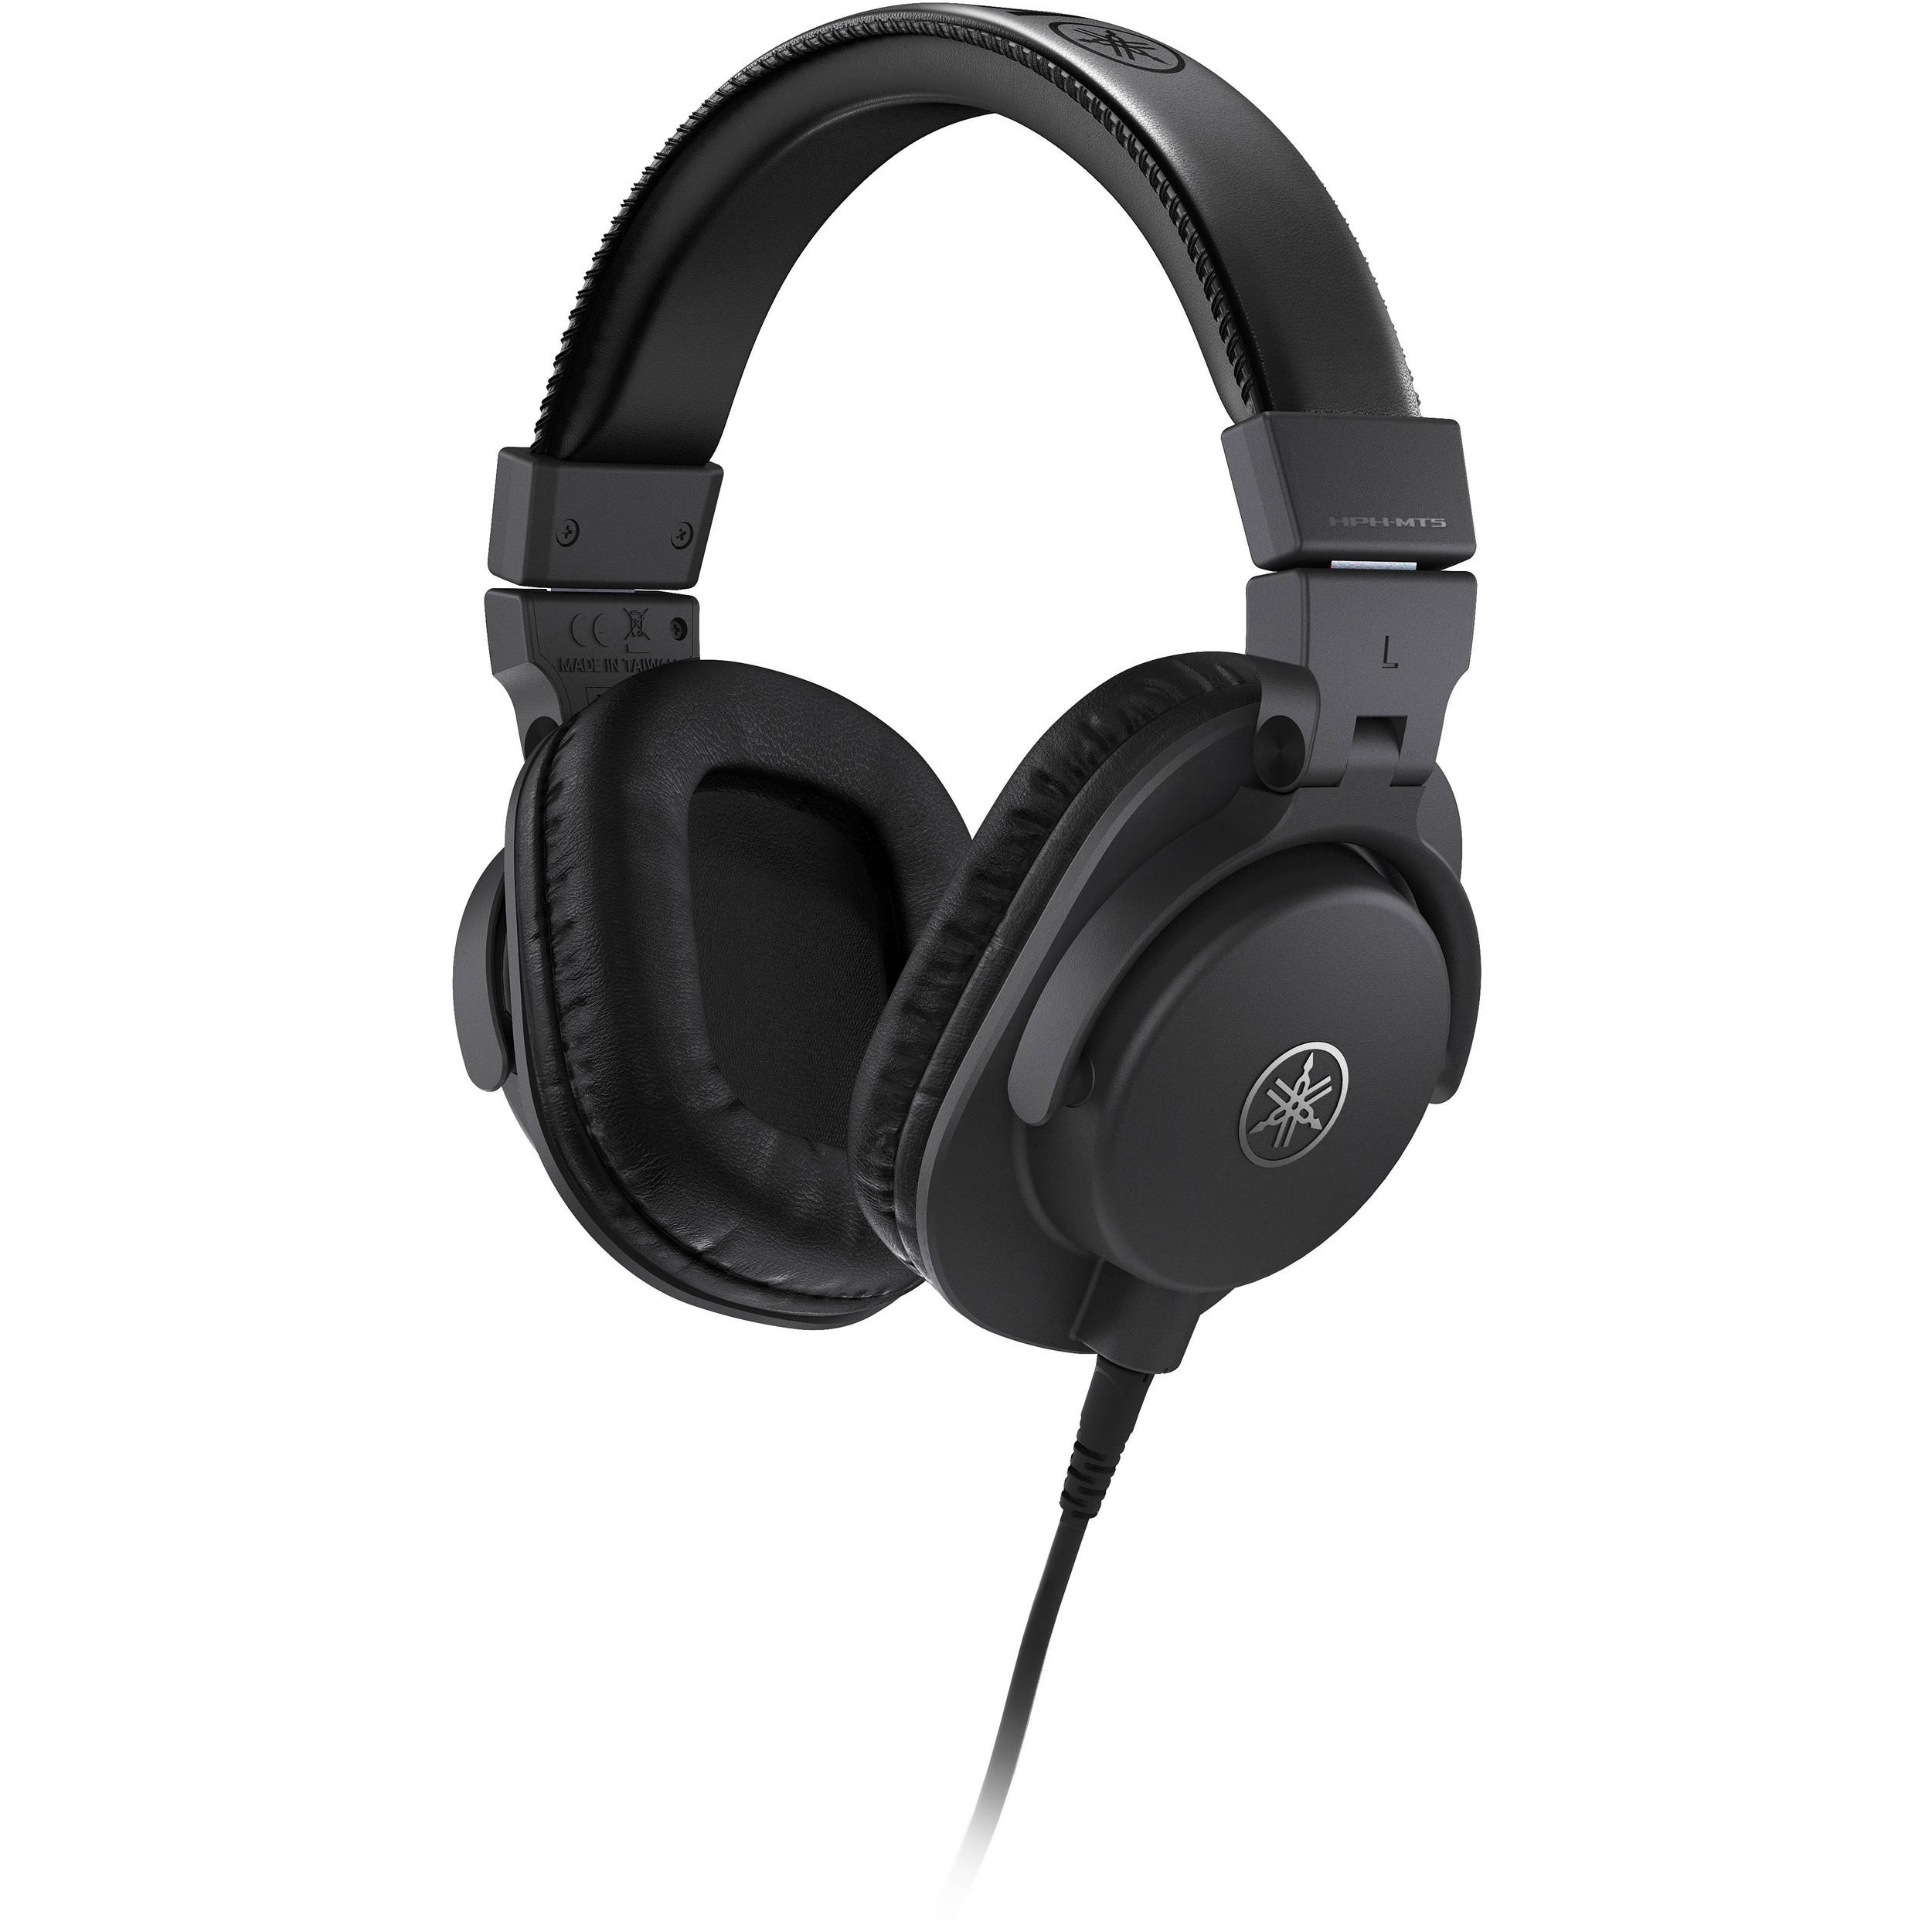 yamaha hph mt5 studio monitor headphones black hph mt5 b h. Black Bedroom Furniture Sets. Home Design Ideas